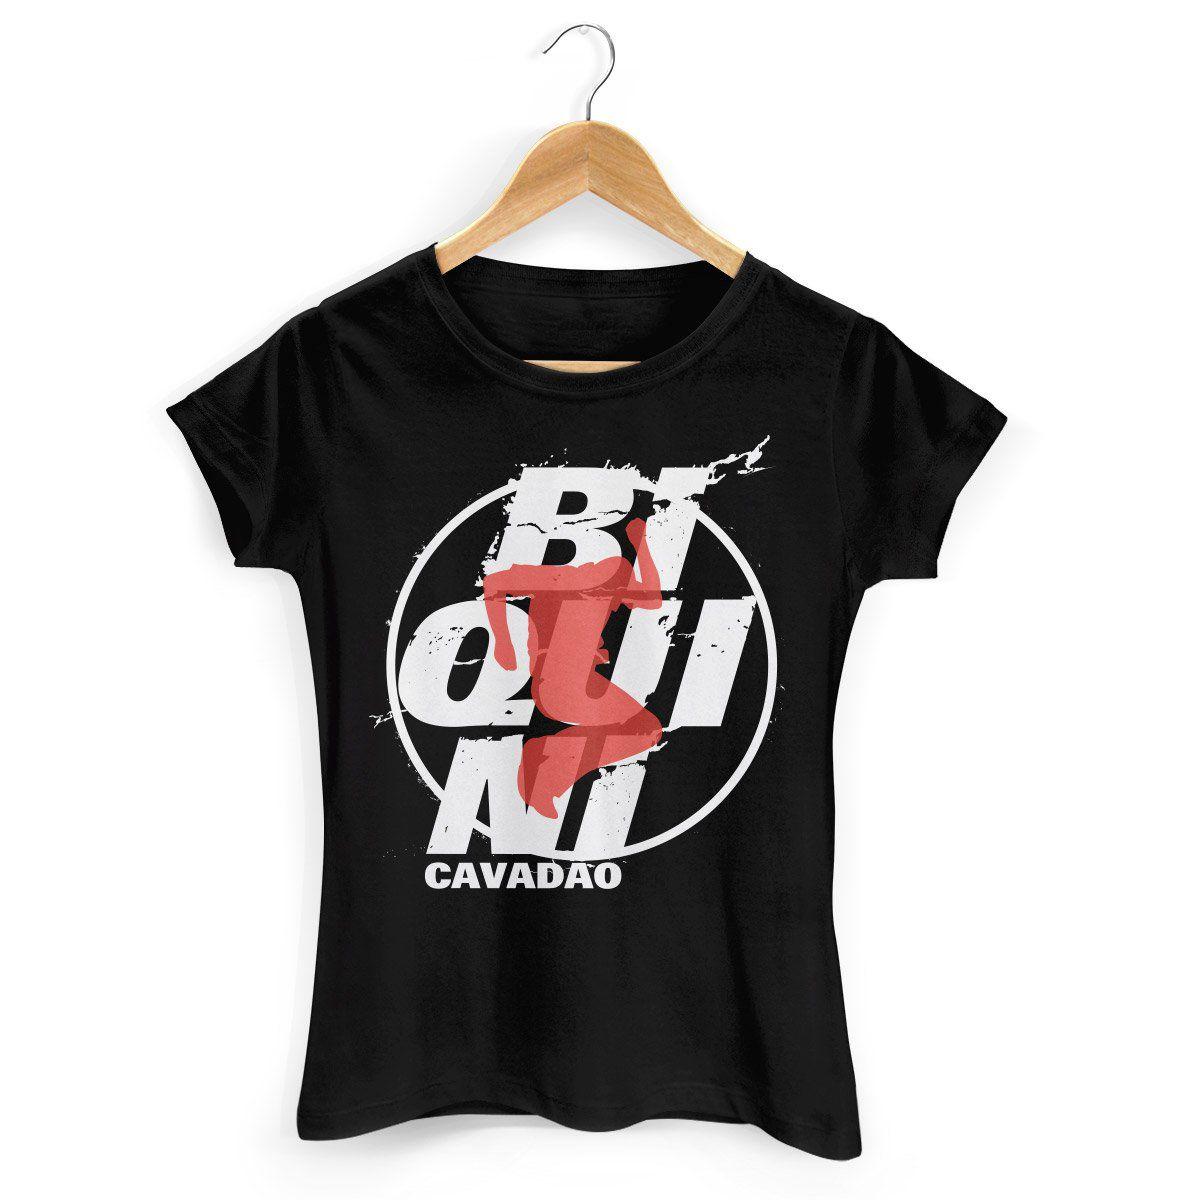 Camiseta Feminina Biquini Cavadão Logo Ao Vivo  - bandUP Store Marketplace